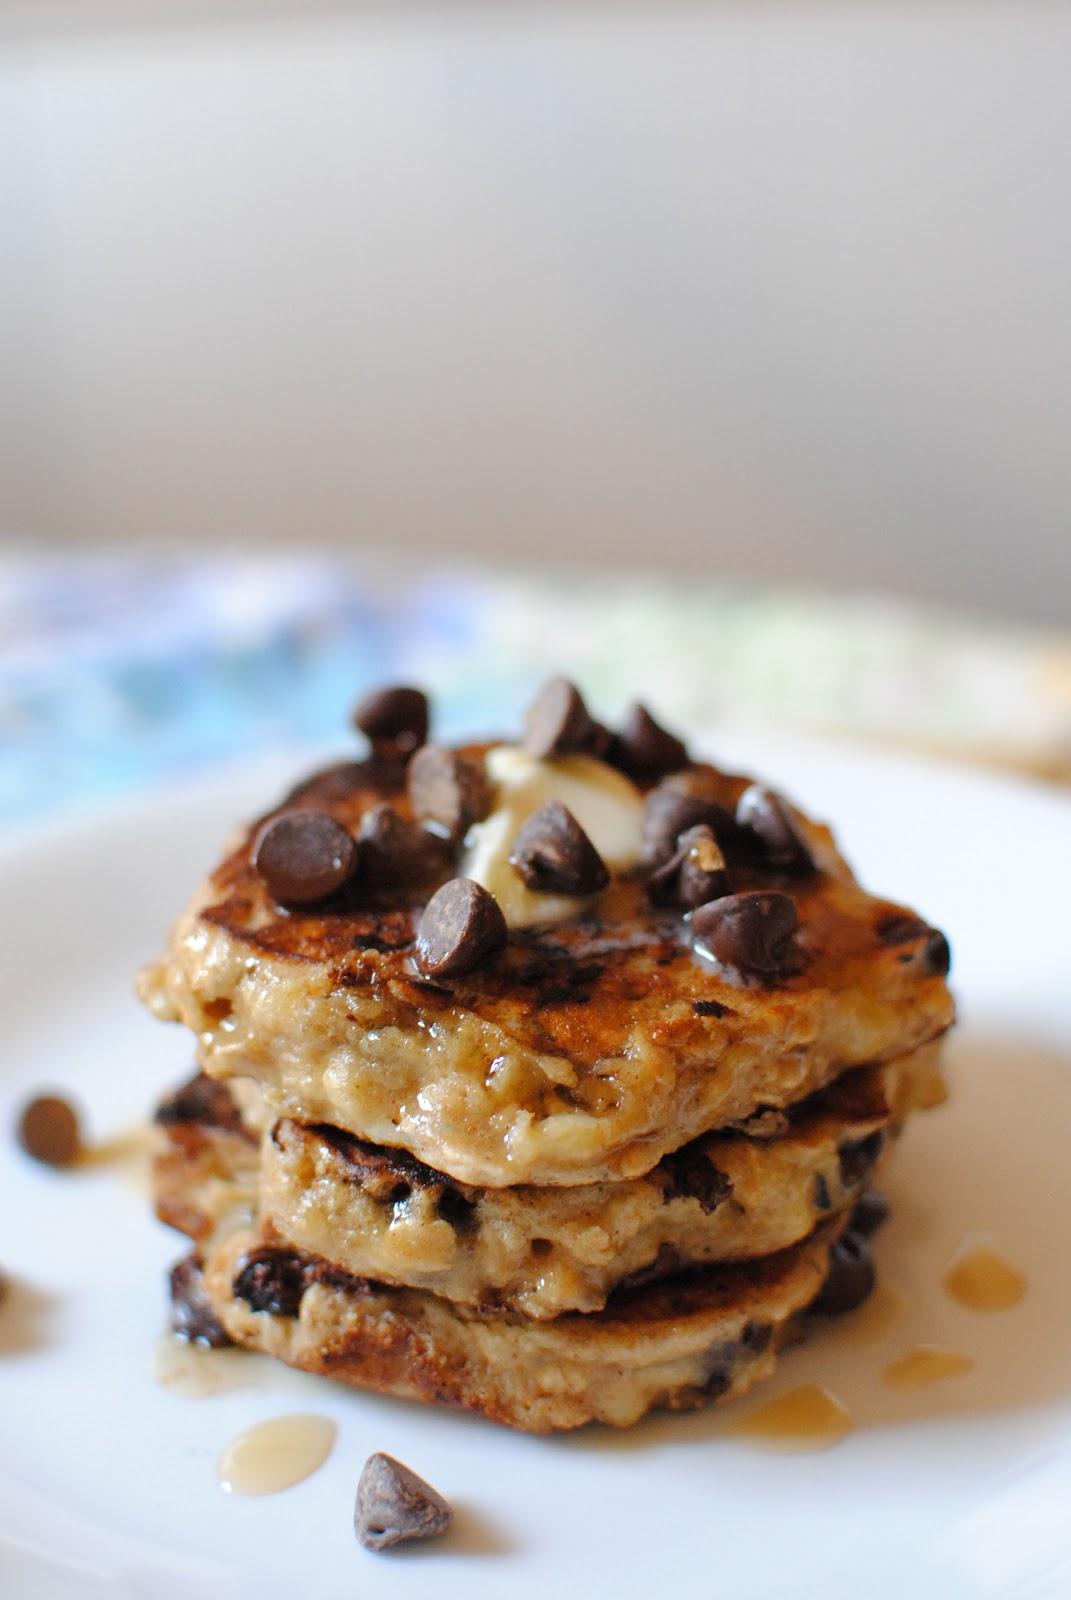 Whole Grain Oatmeal Chocolate Chip Pancakes   Grain Mill Wagon